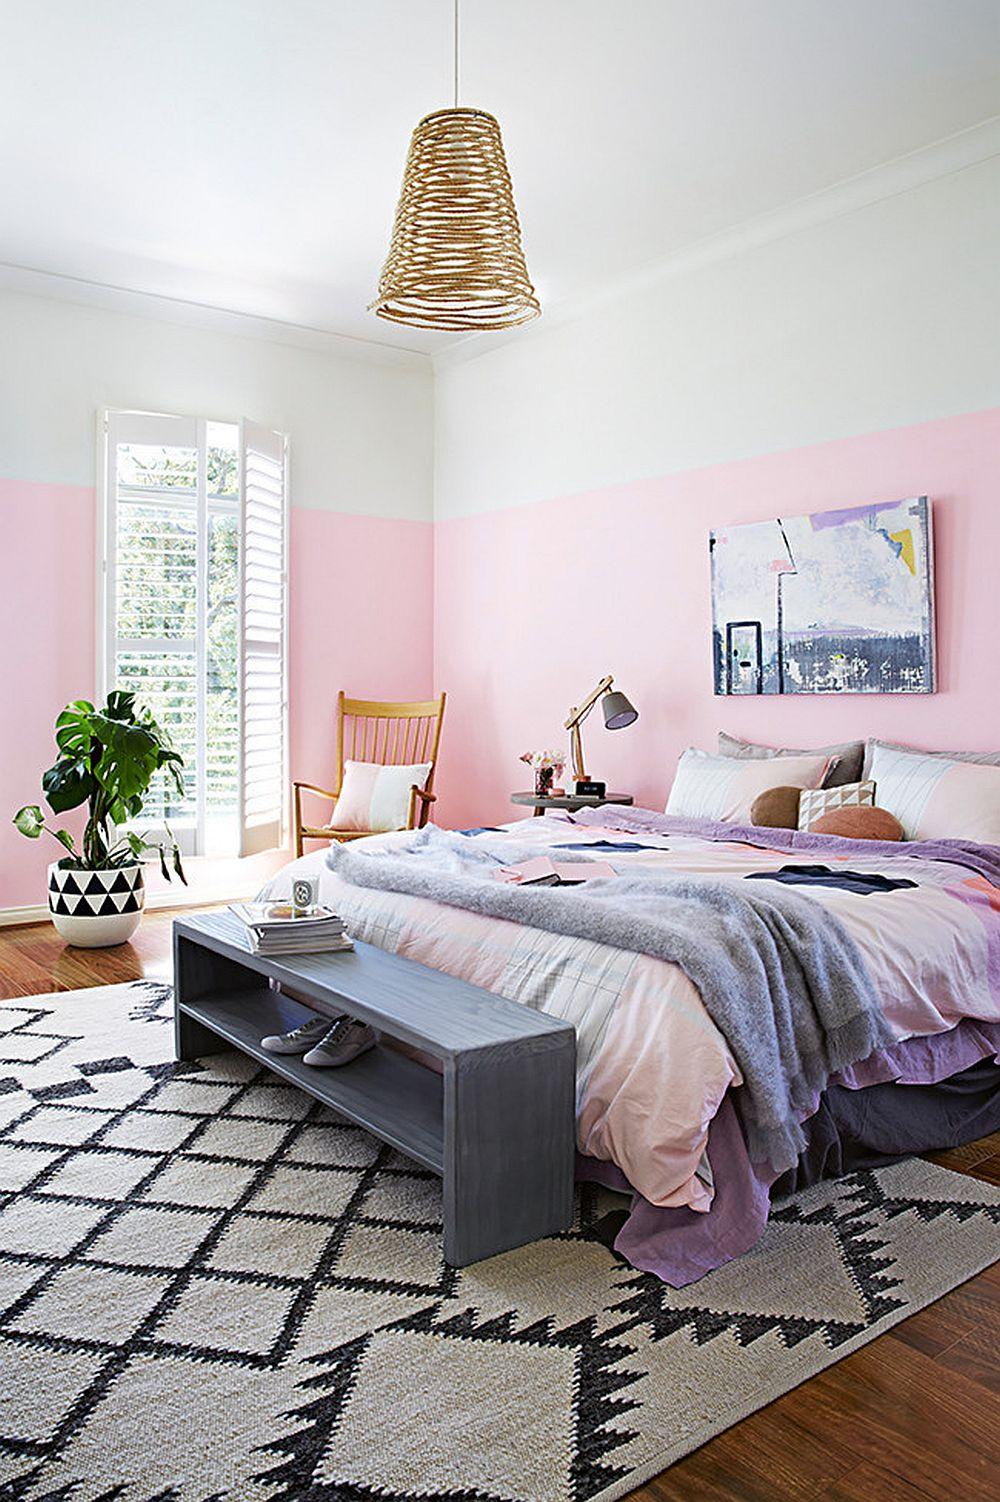 adelaparvu.com despre acelasi dormitor 2 variante de decorare, stilist Julia Green, Foto Armelle Habib  (2)